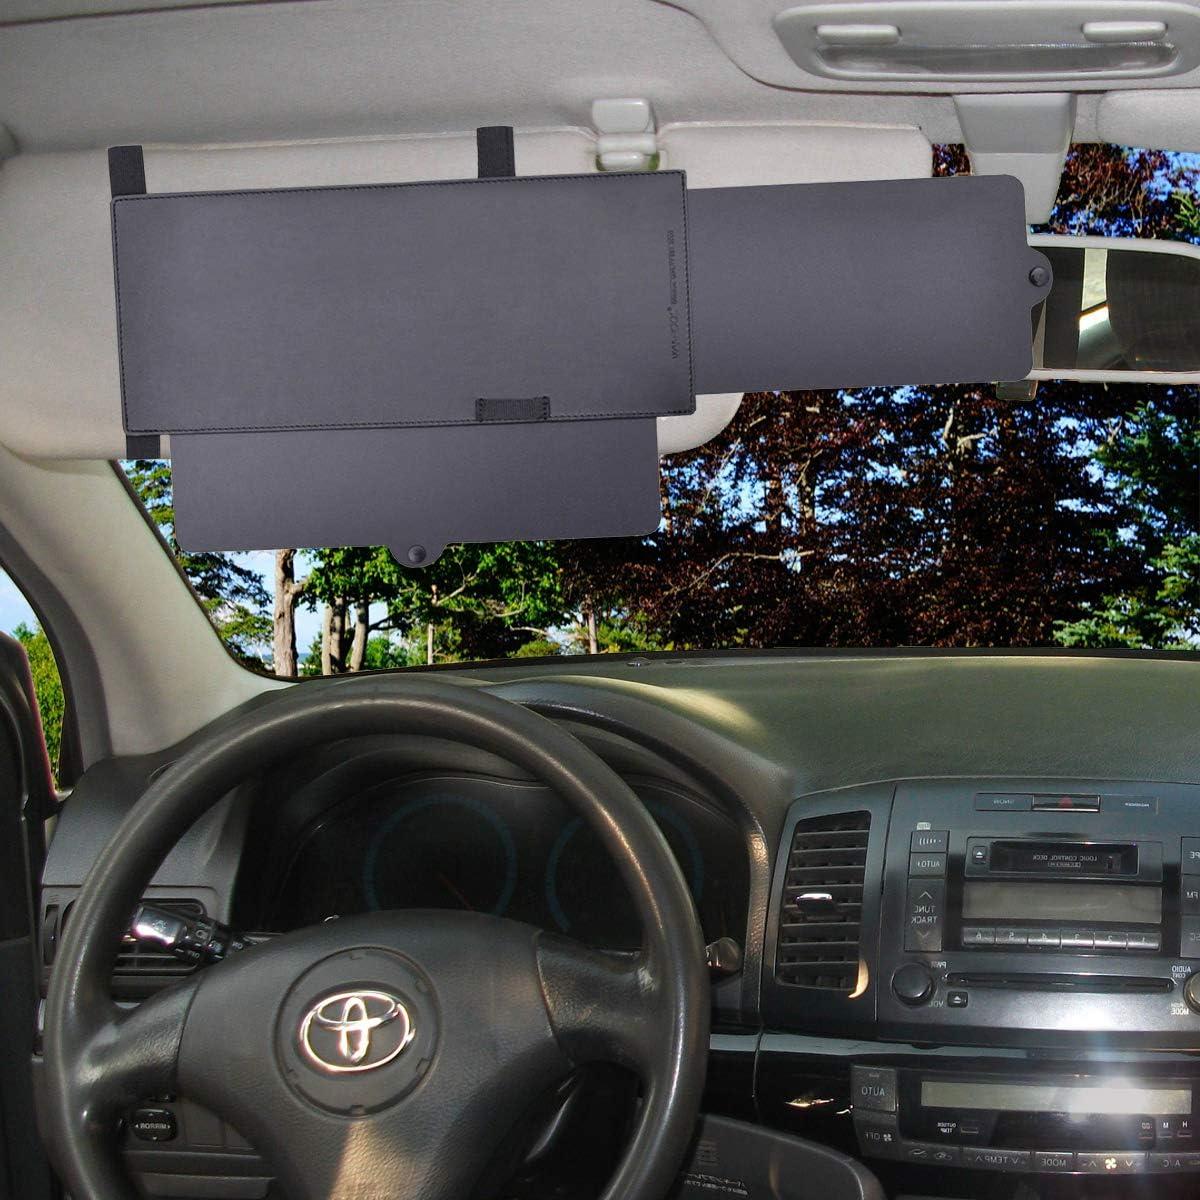 Window Sun Shade Extendable Visor VaygWay Car Visor Sunshade Extender Windshield Auto Sun Visor Extender Extendable Car Visor Anti Glare Universal Car SUV Sun Shade